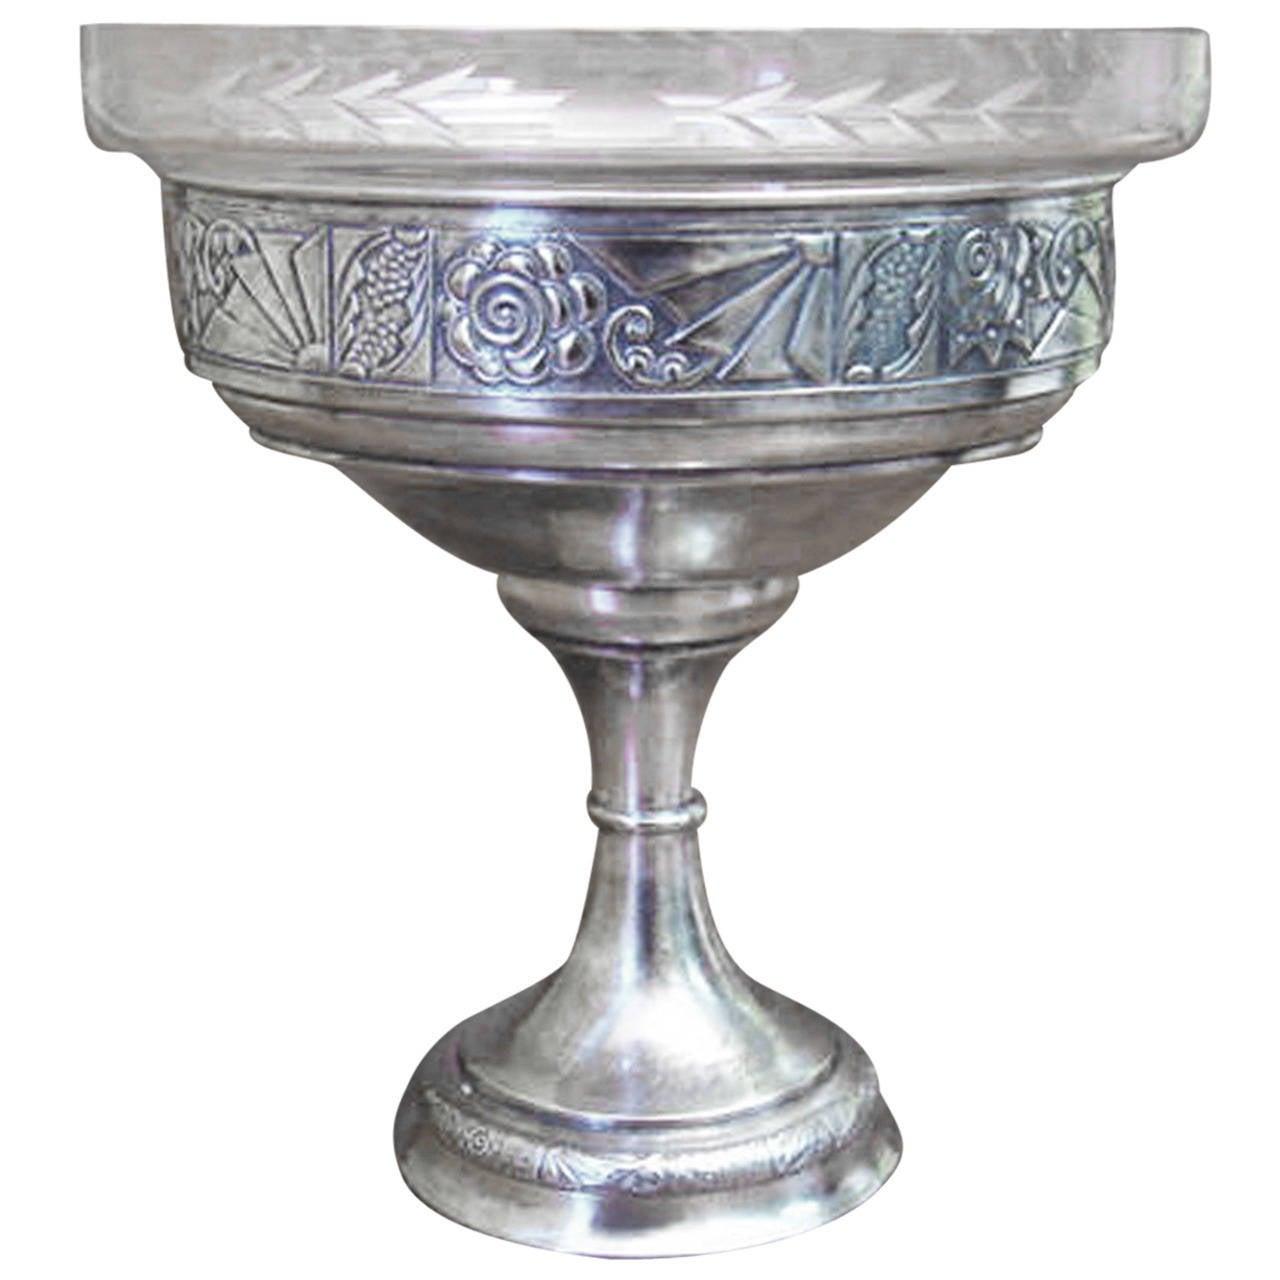 Art Nouveau WMF Bowl with Glass Insert